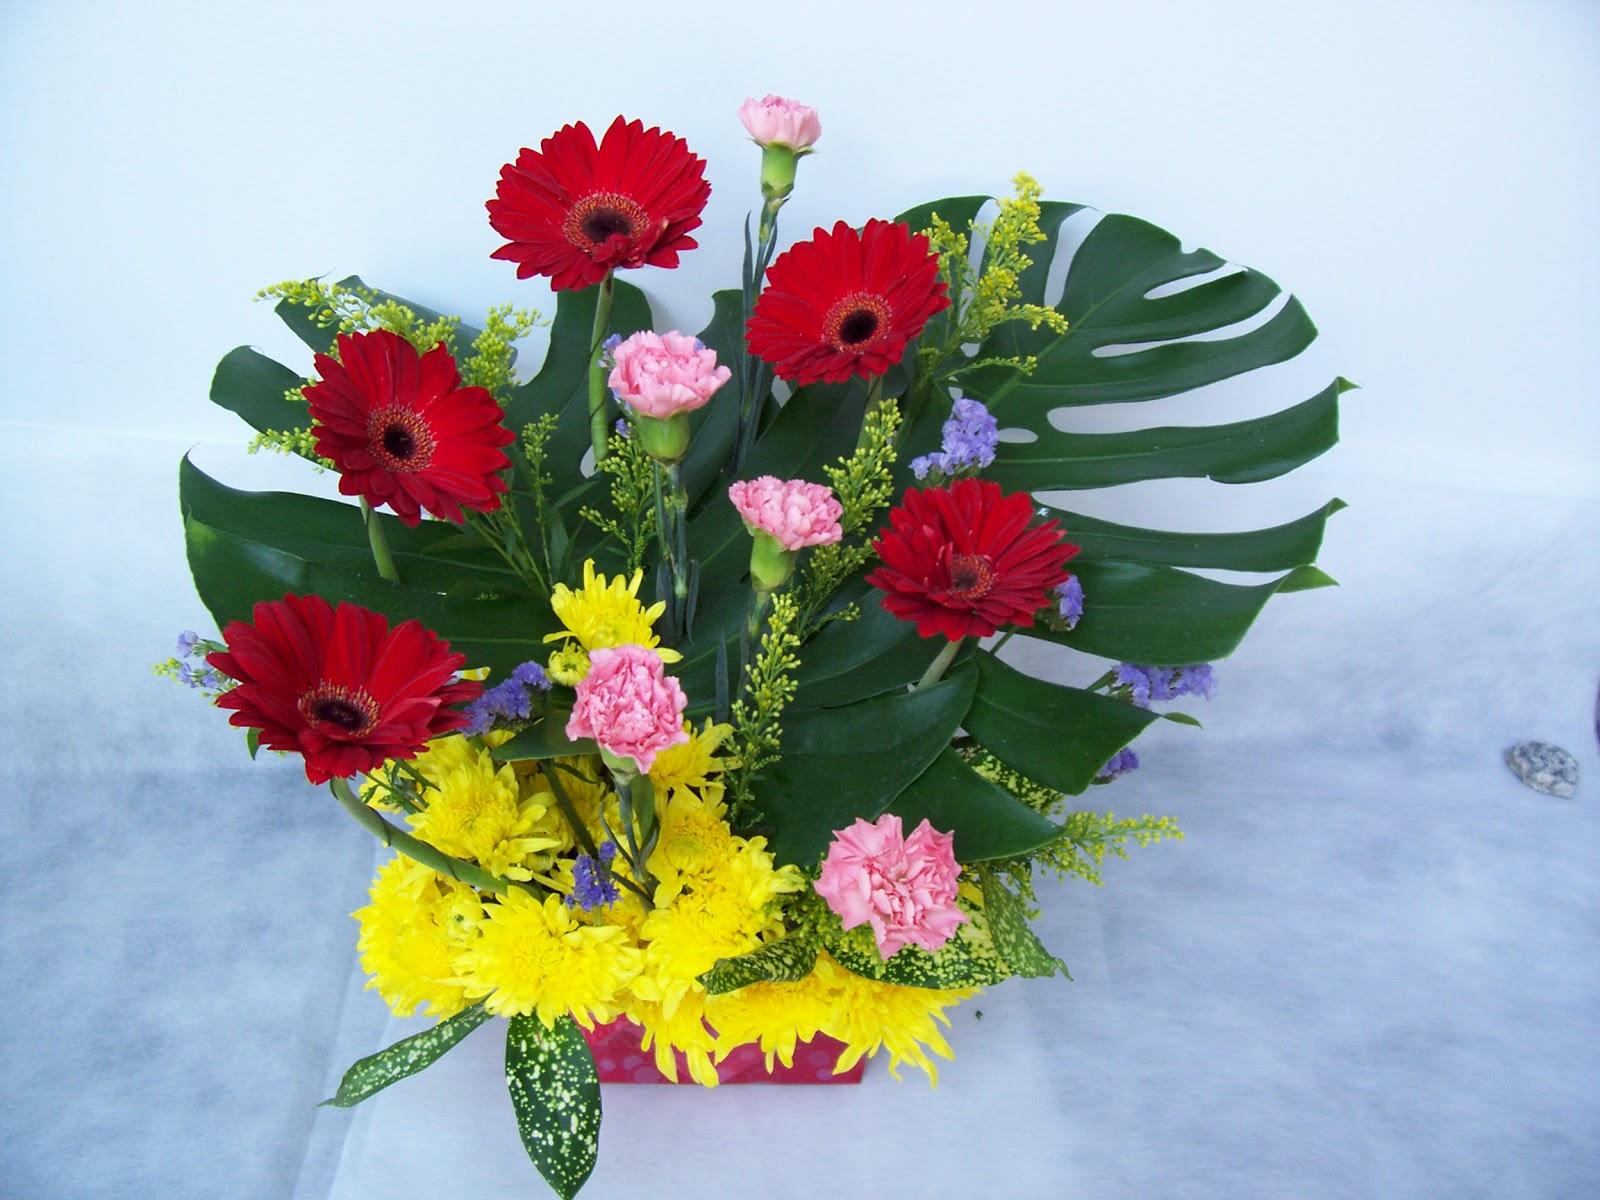 Flower Arrangements Gift Baskets : E flower gift basket arrangement